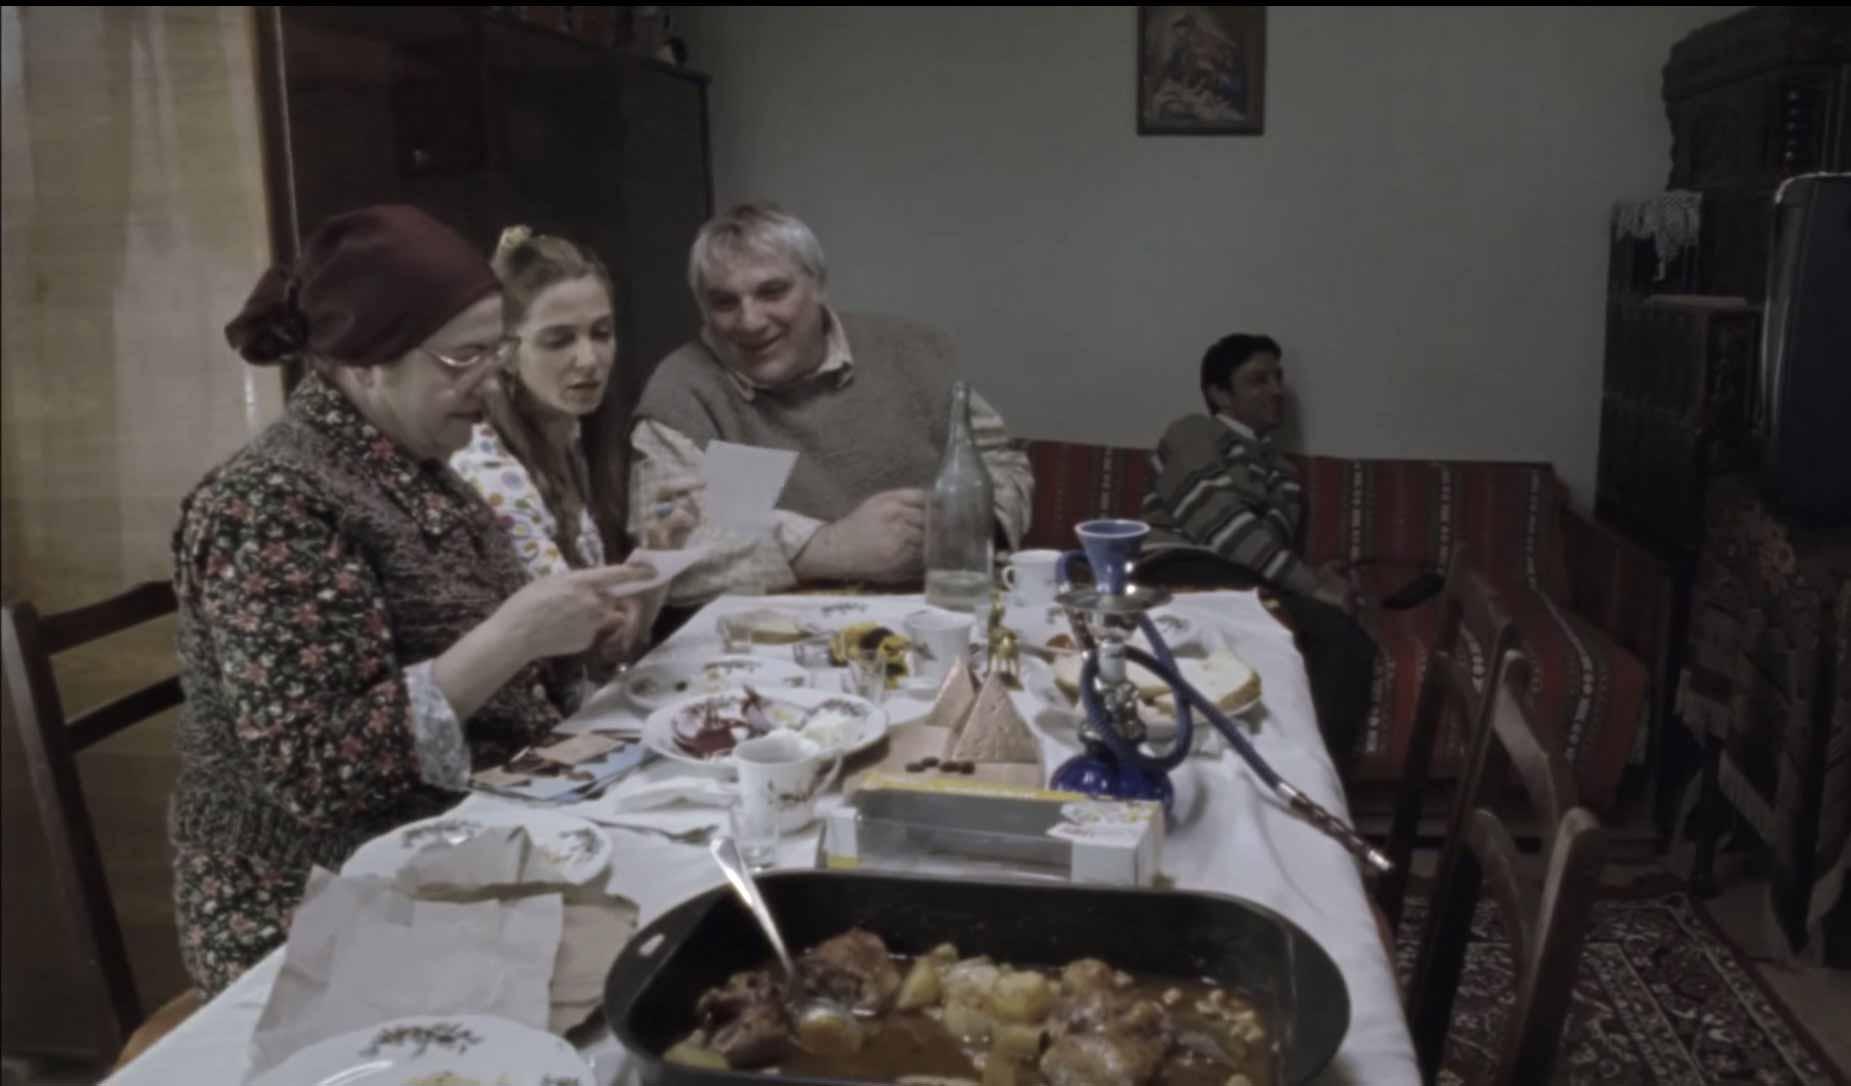 Cealalta Irina de Andrei Gruzsniczki - 2009